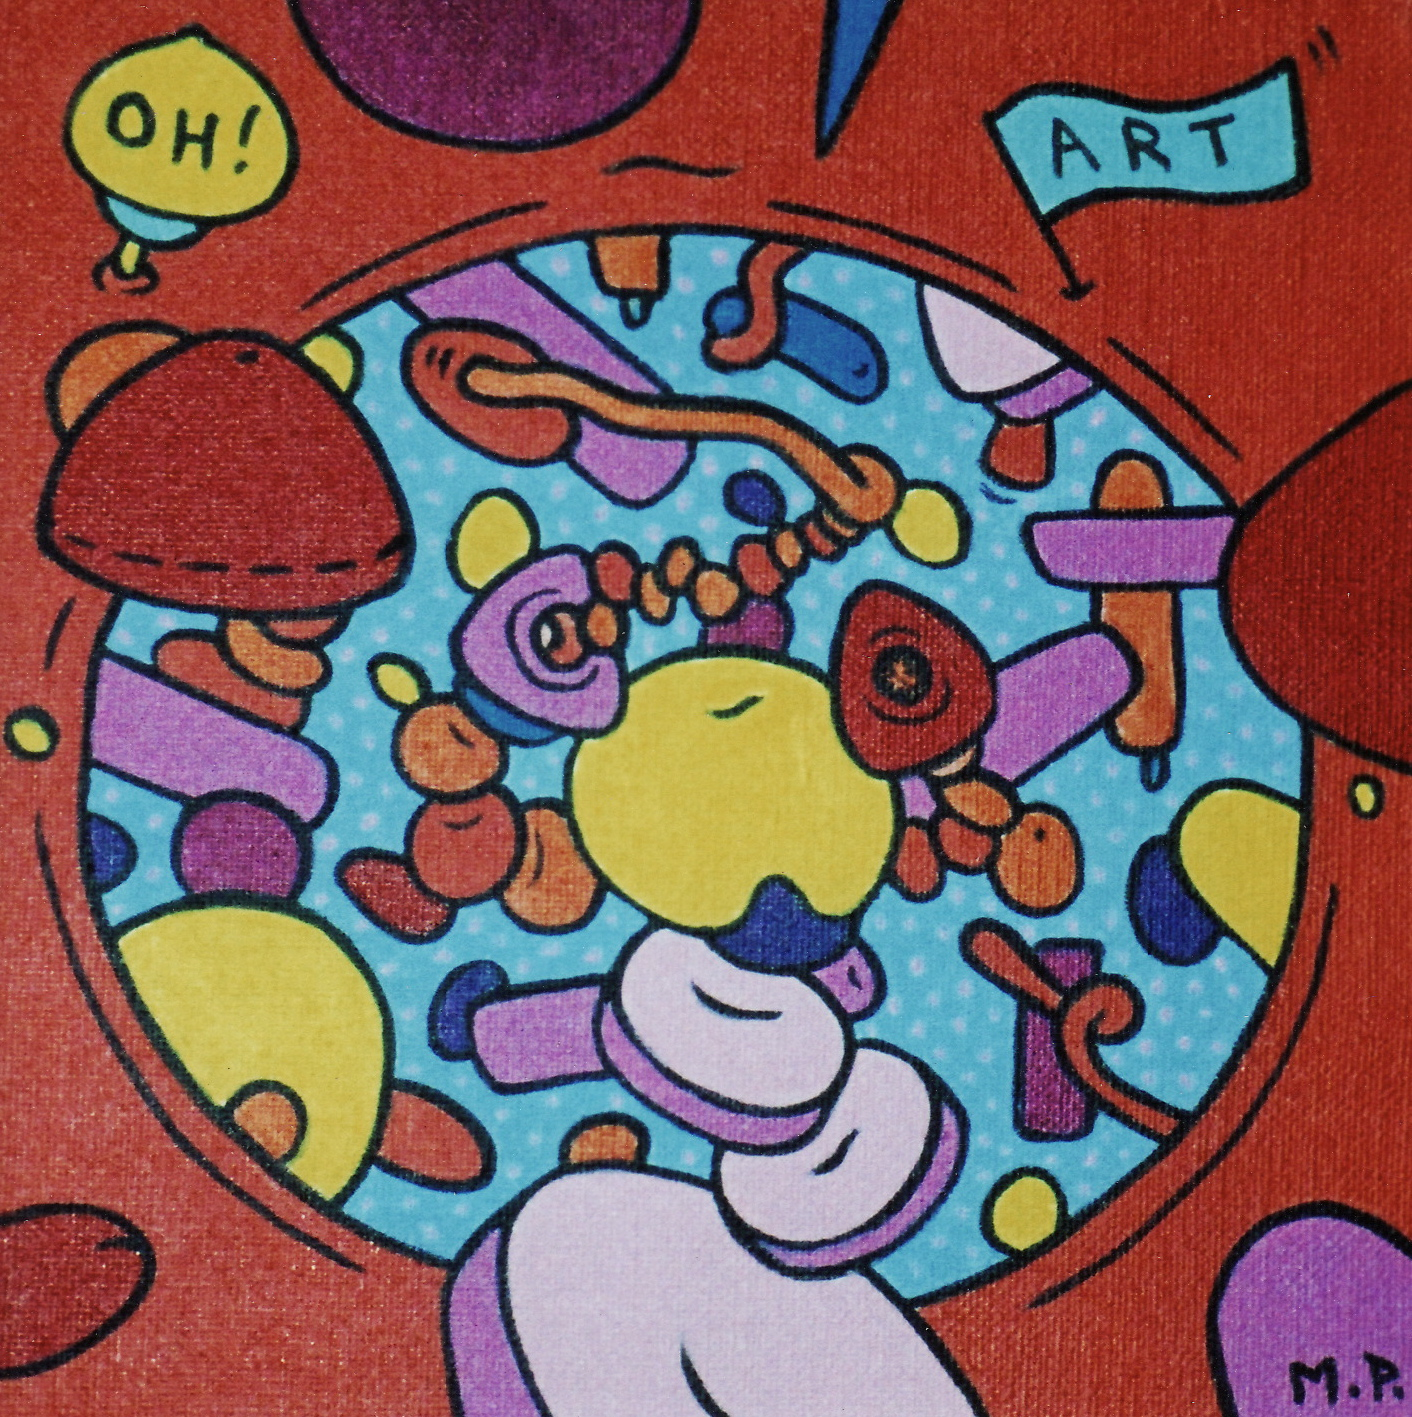 Oh, Art ! (20x20)